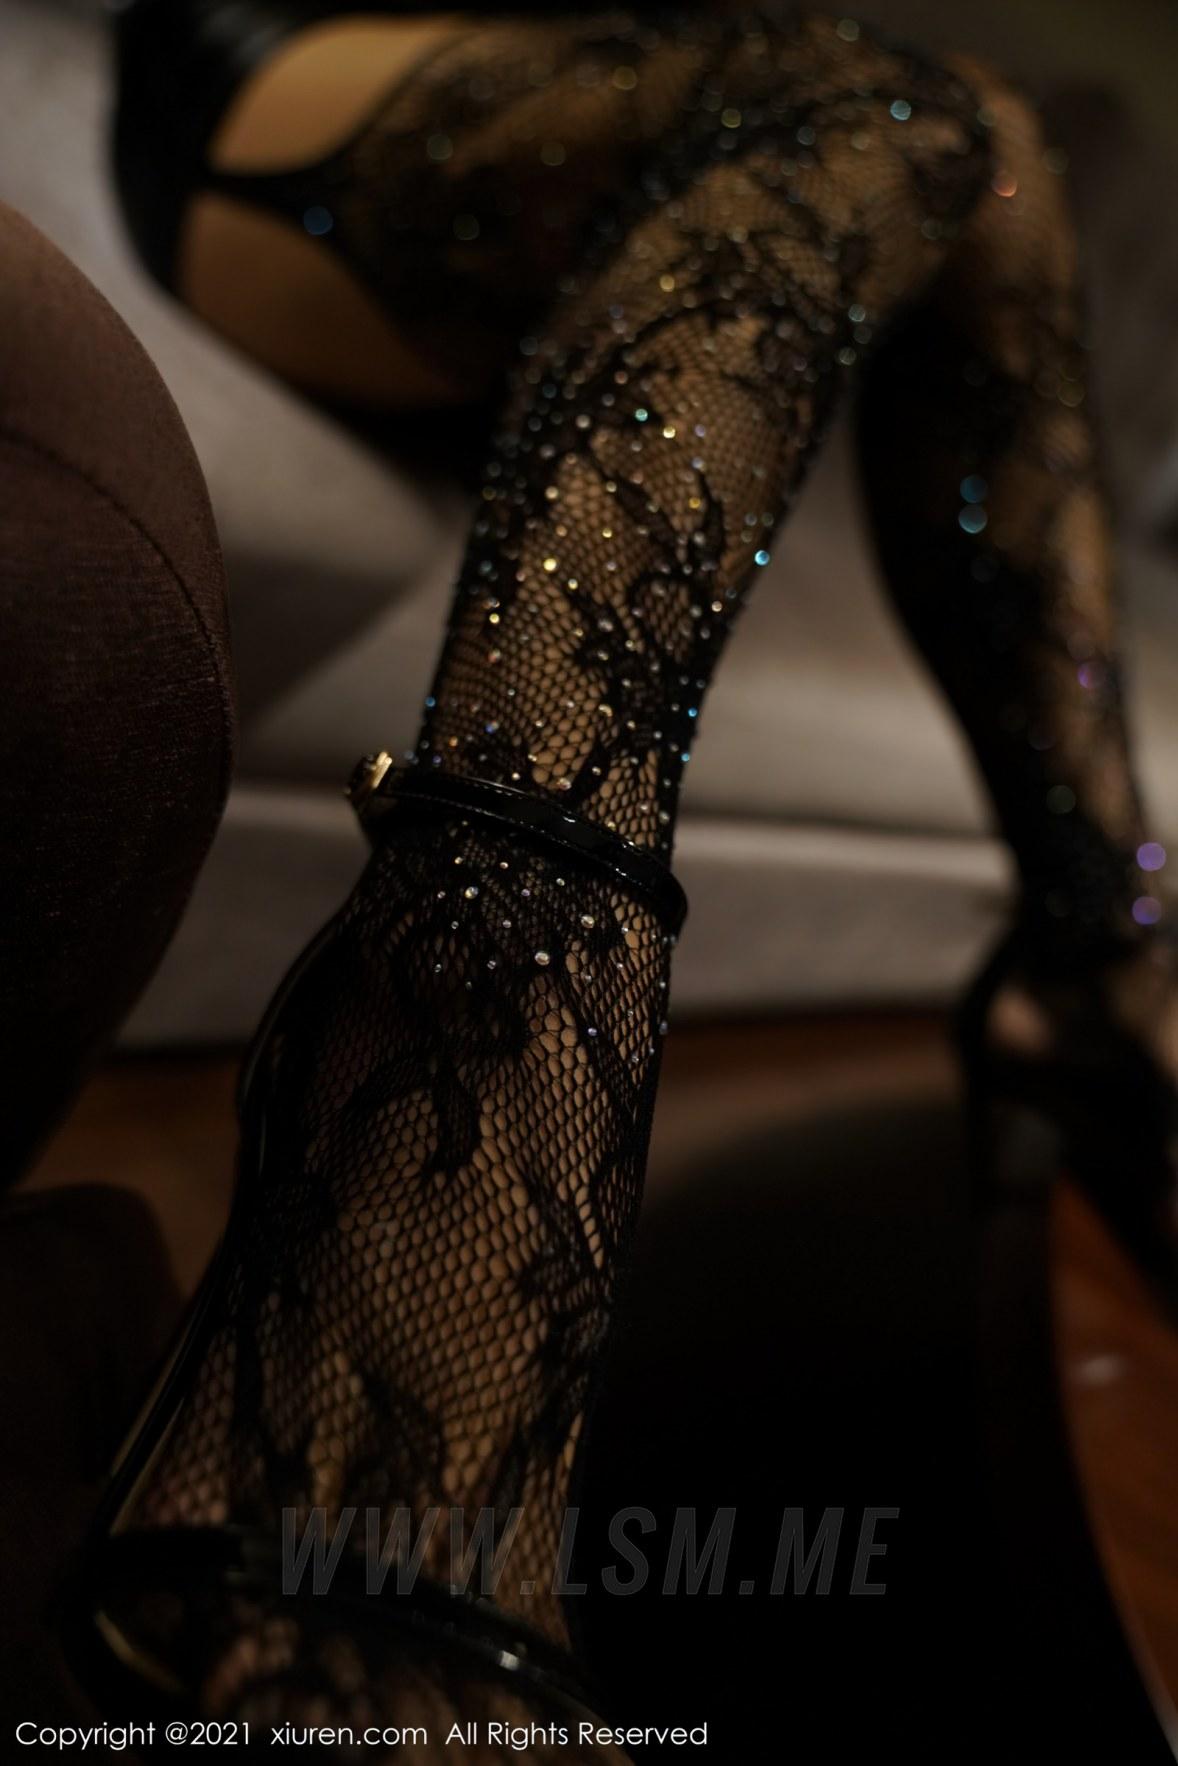 3785 022 mkt 3603 5400 - XiuRen 秀人 No.3785 皮裙与魅惑 蓝夏Akasha 北京旅拍3 - 秀人网 【私房高清壁纸视频素材】【免费在线写真】【丽人丝语】